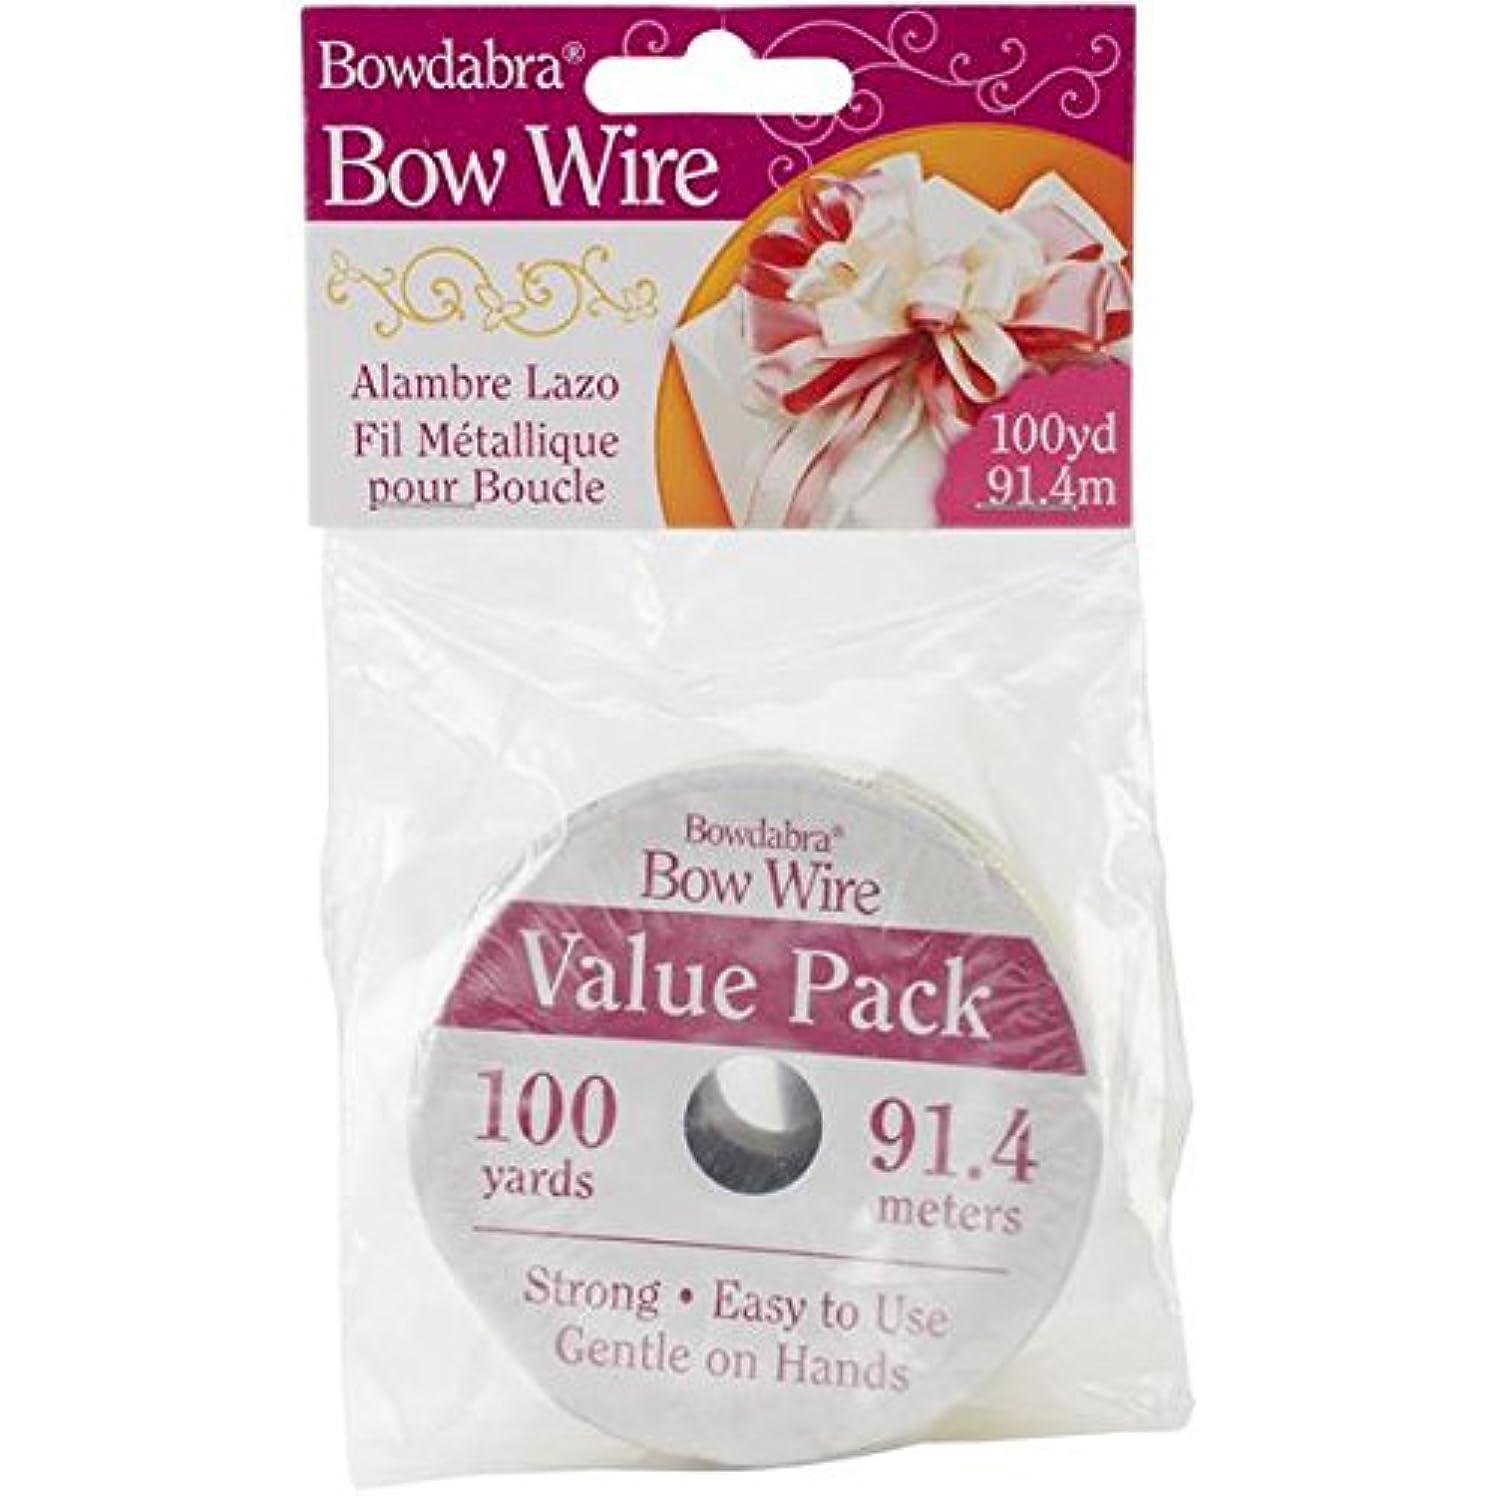 Darice Bowdabra Bow Wire, 100-Yard, Gold